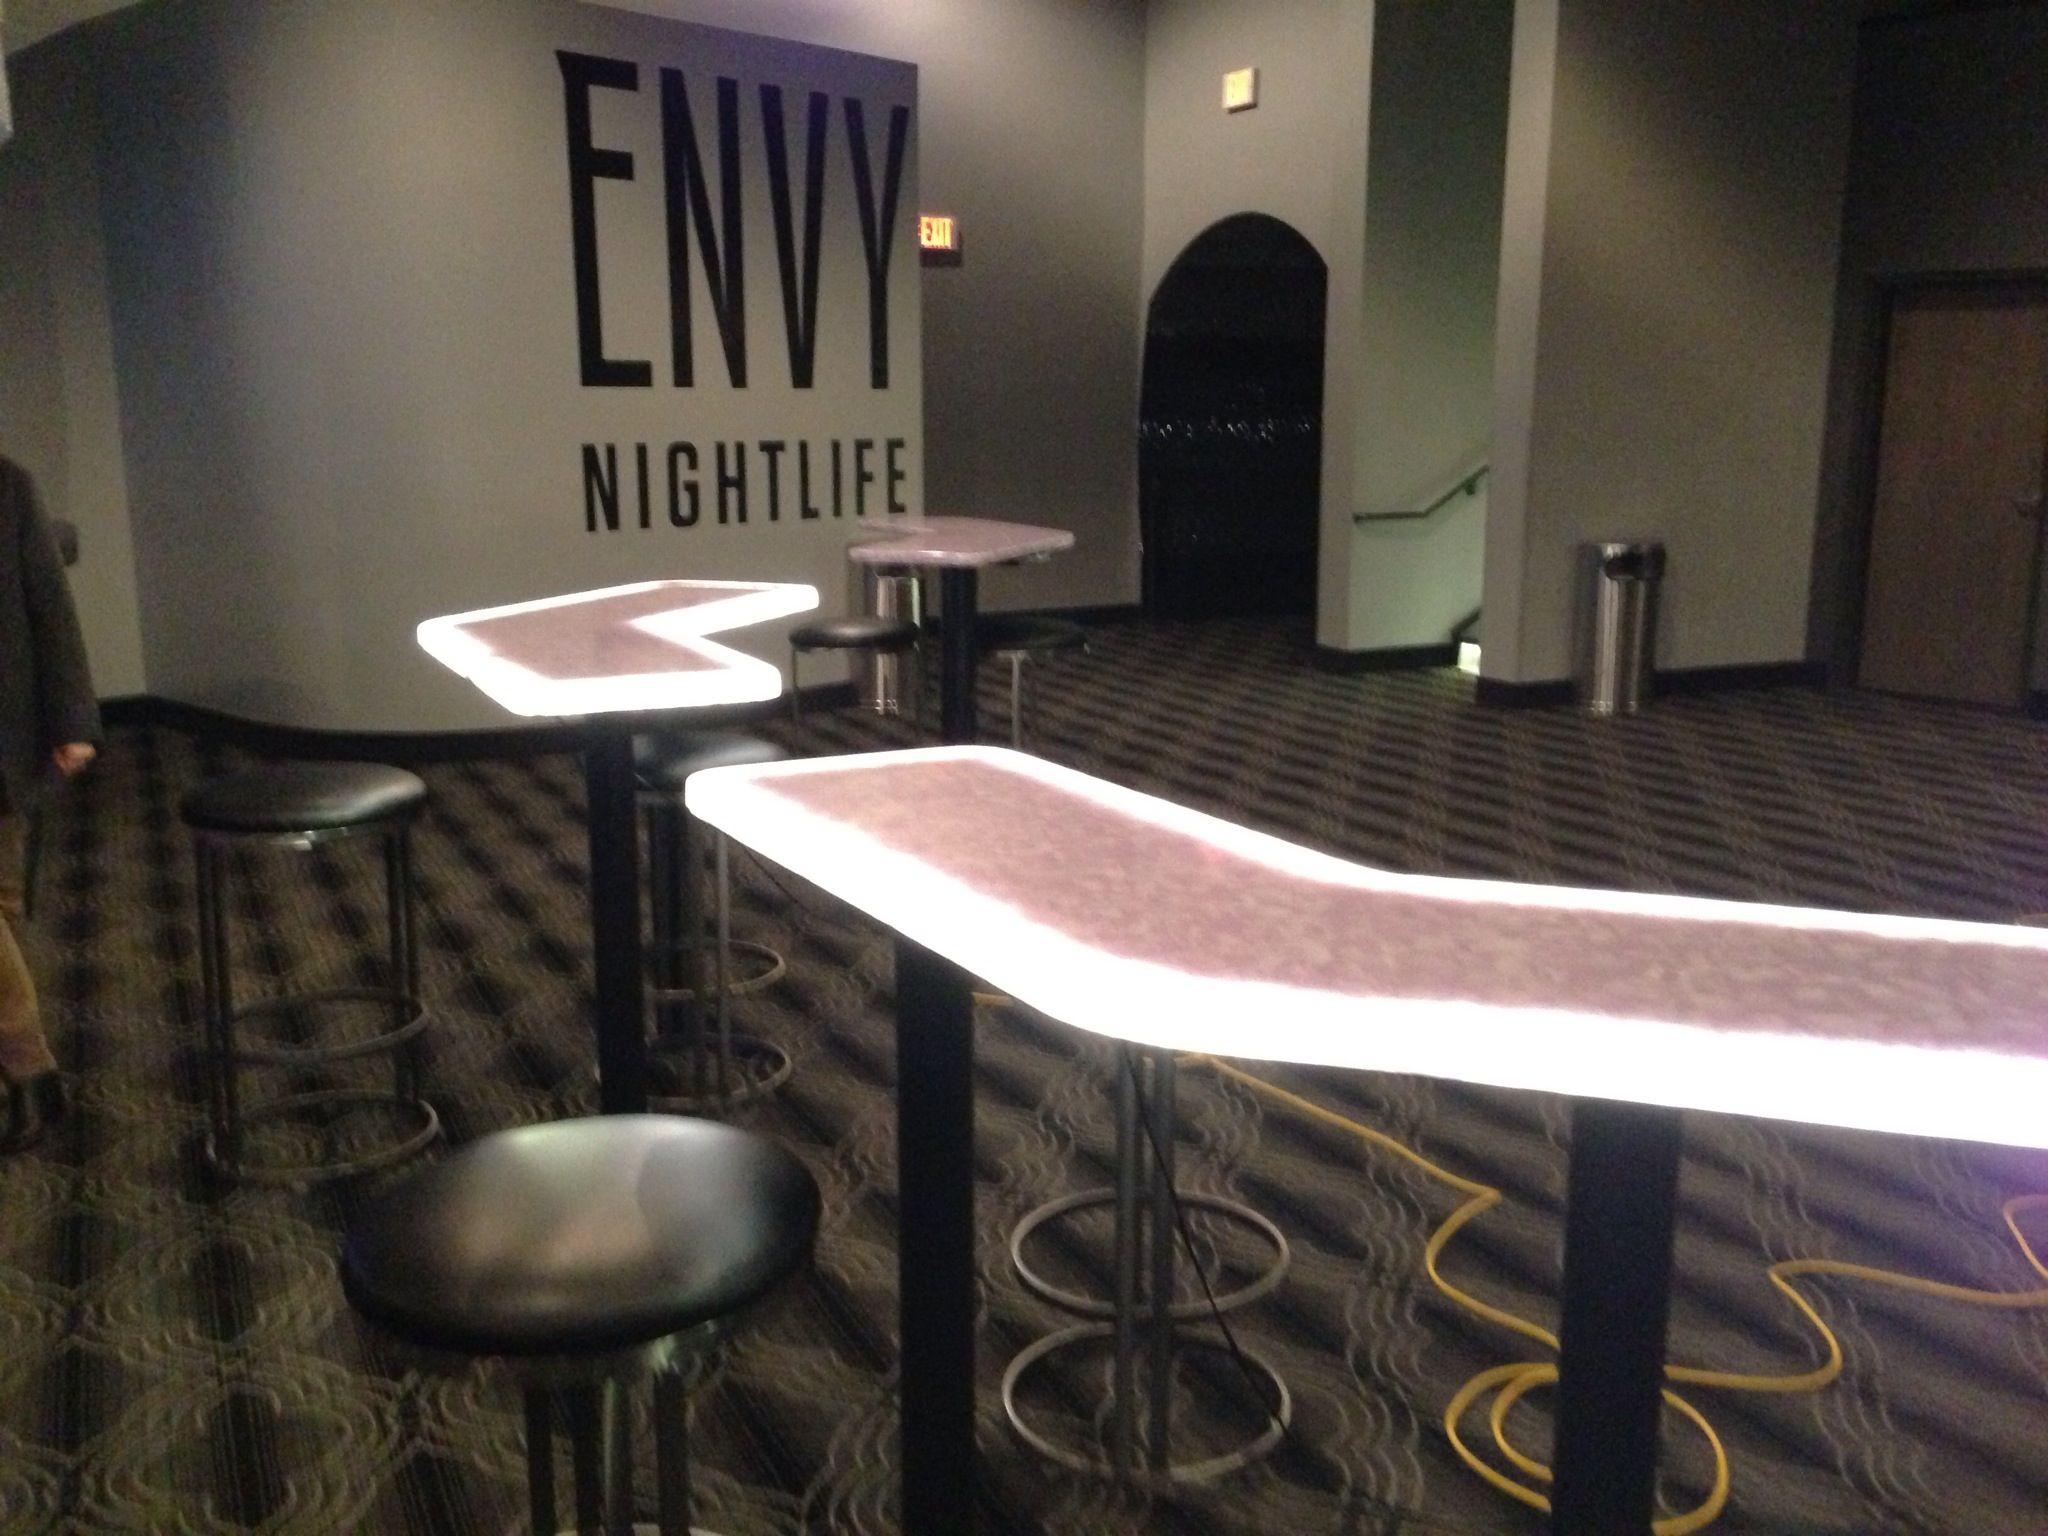 Avonite Studio Collection - Petals - at Envy nightclub in Casino 66 ...